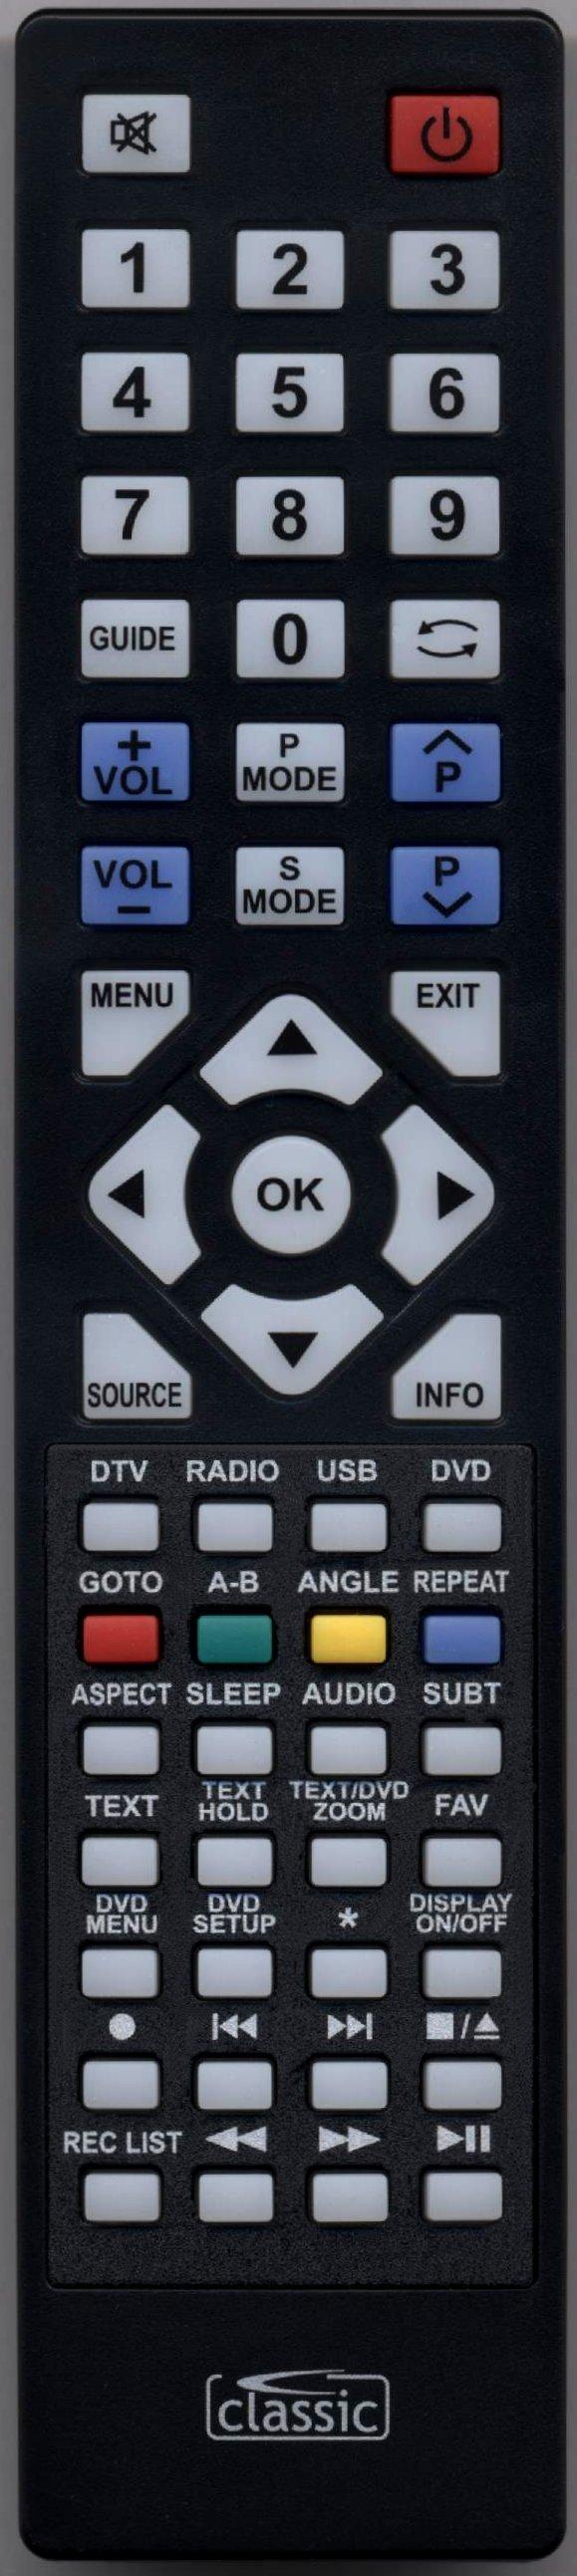 Blaupunkt 32/133O-WB-11B-EGDP-UK Remote Control Alternative